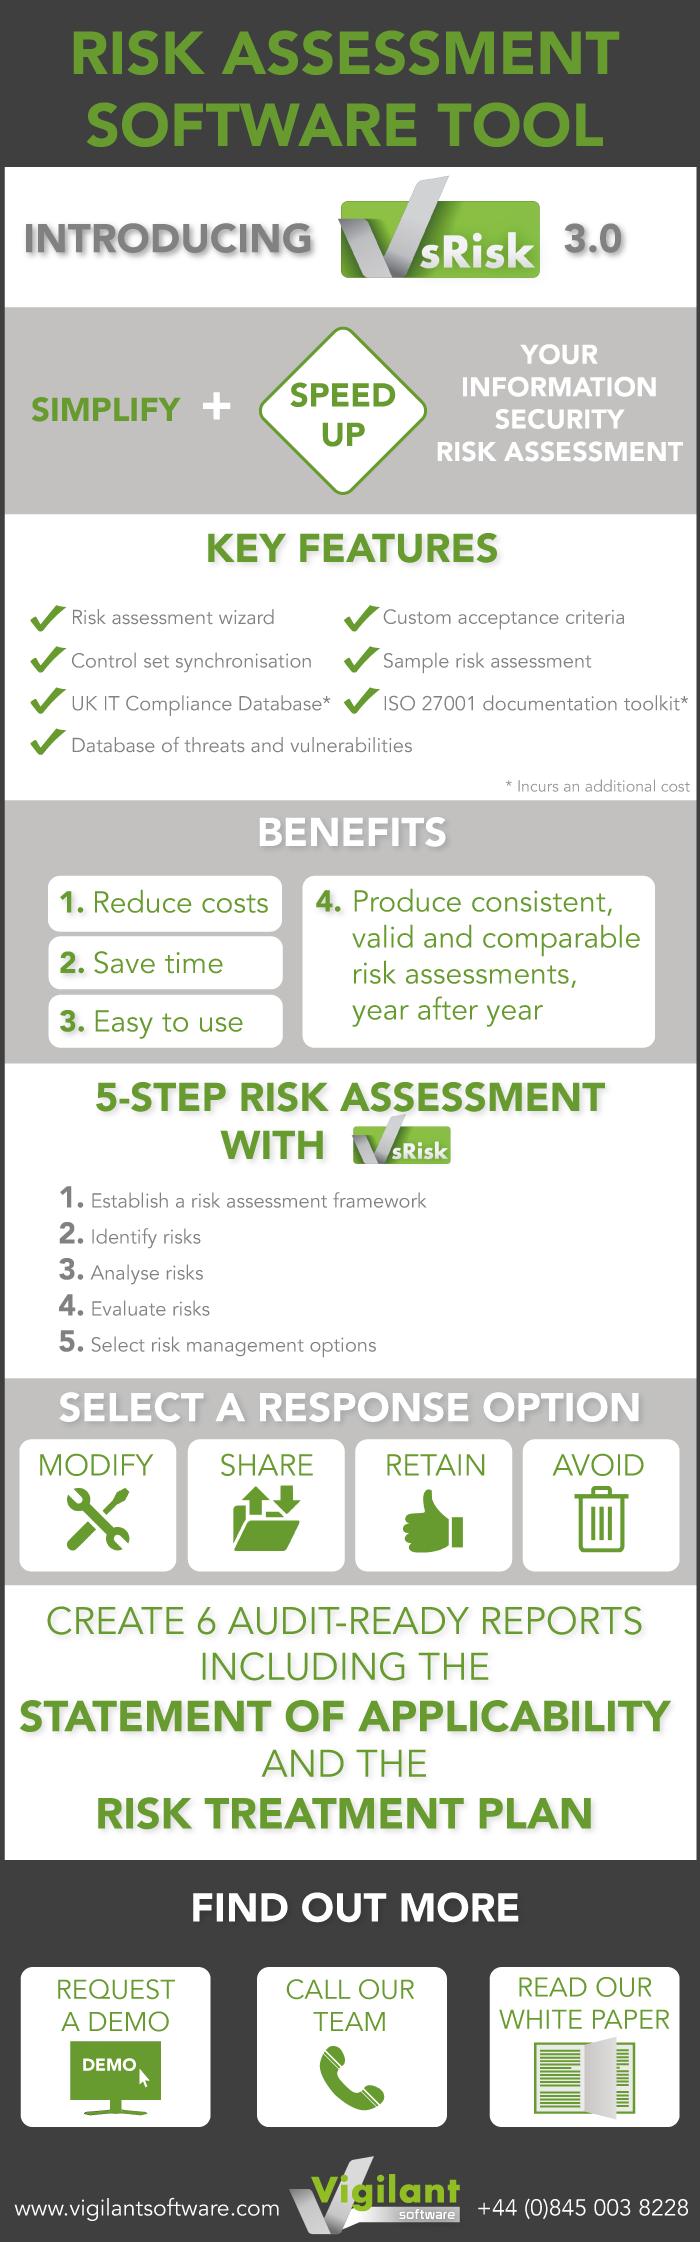 vsRisk™ 3.0: Risk assessment software tool